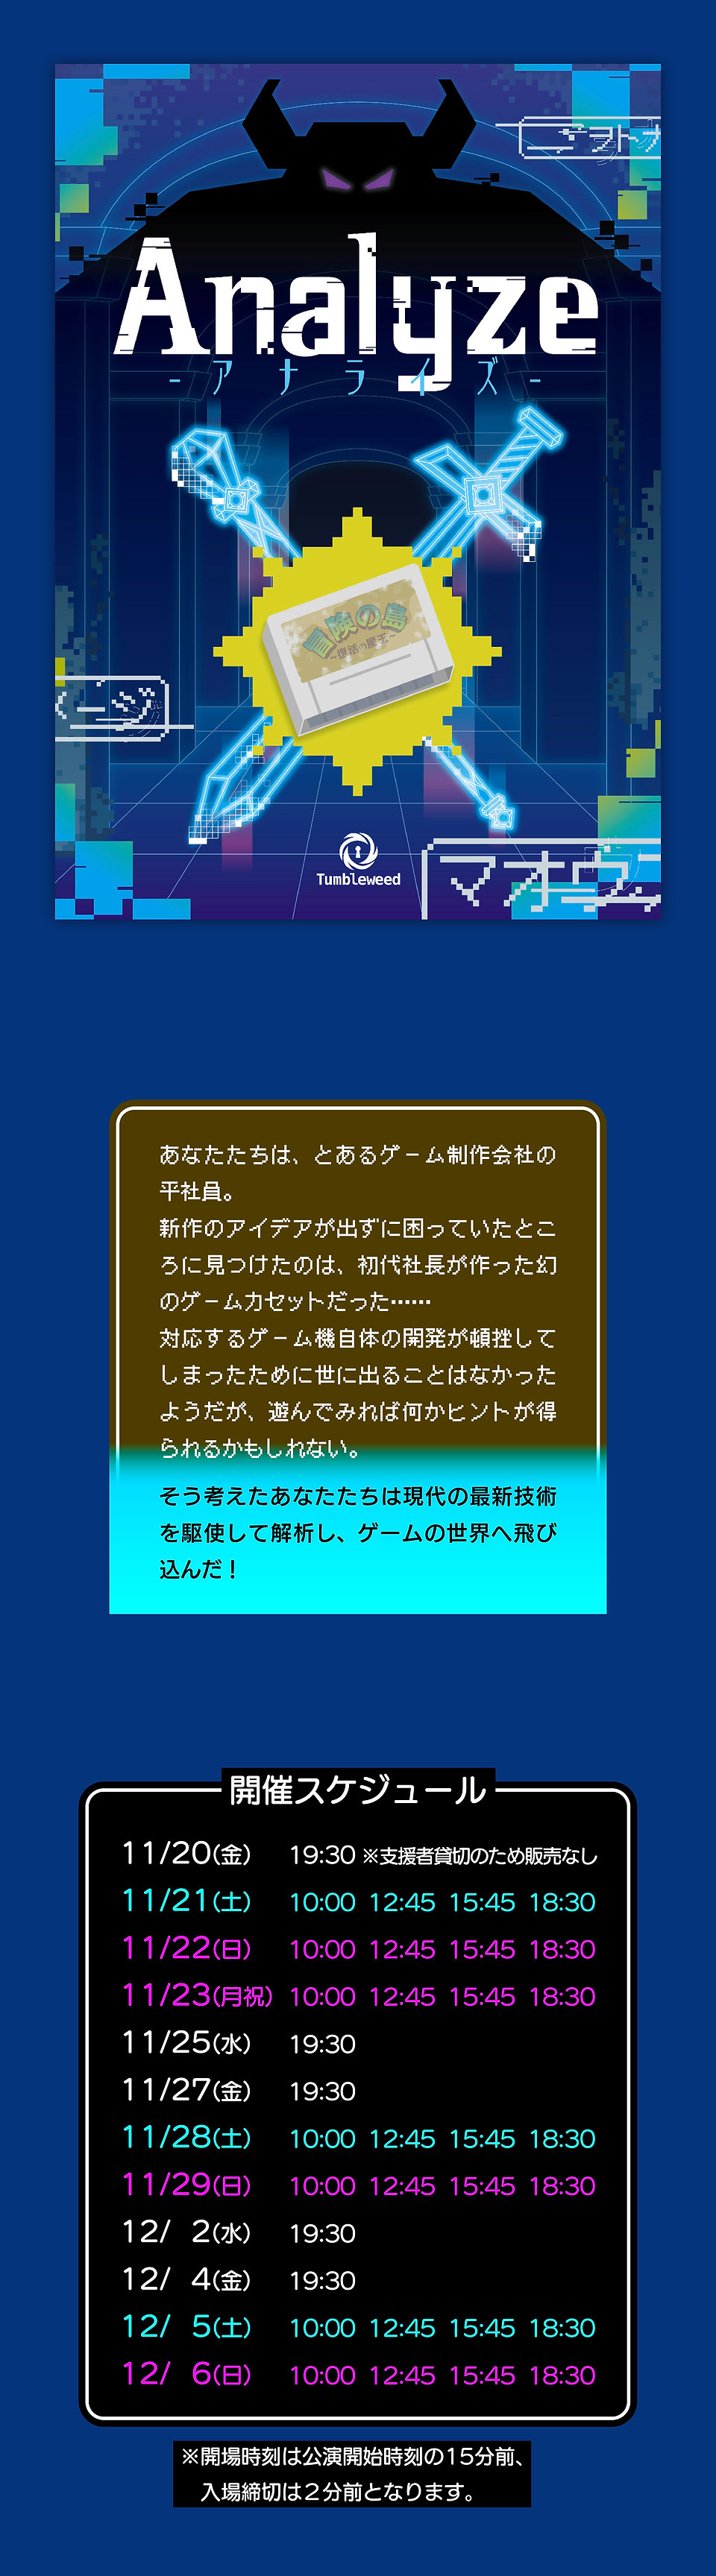 Analyze_1.jpg